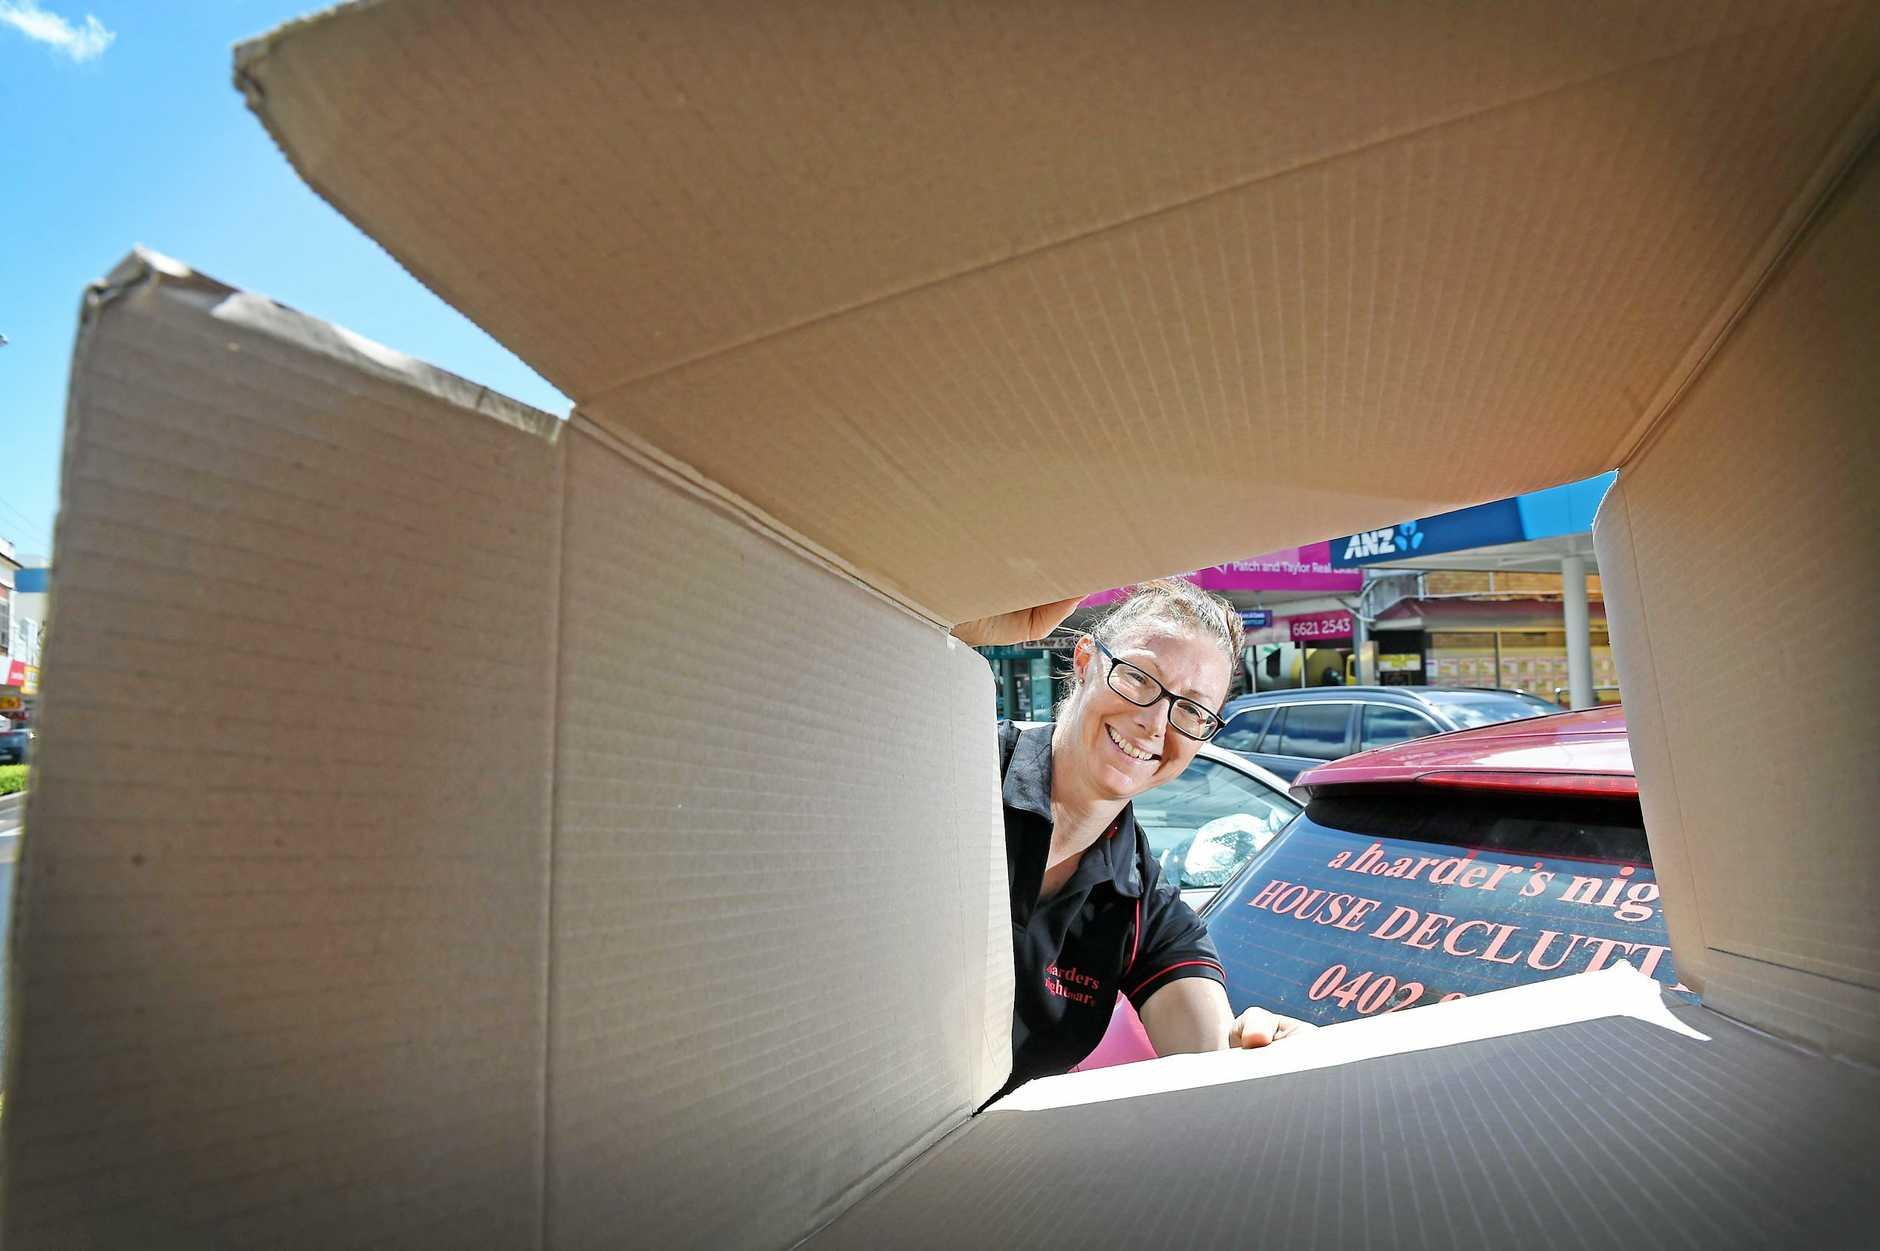 A Hoarders Nightmare owner Christine Hahn helps people get rid of their unwanted stuff.